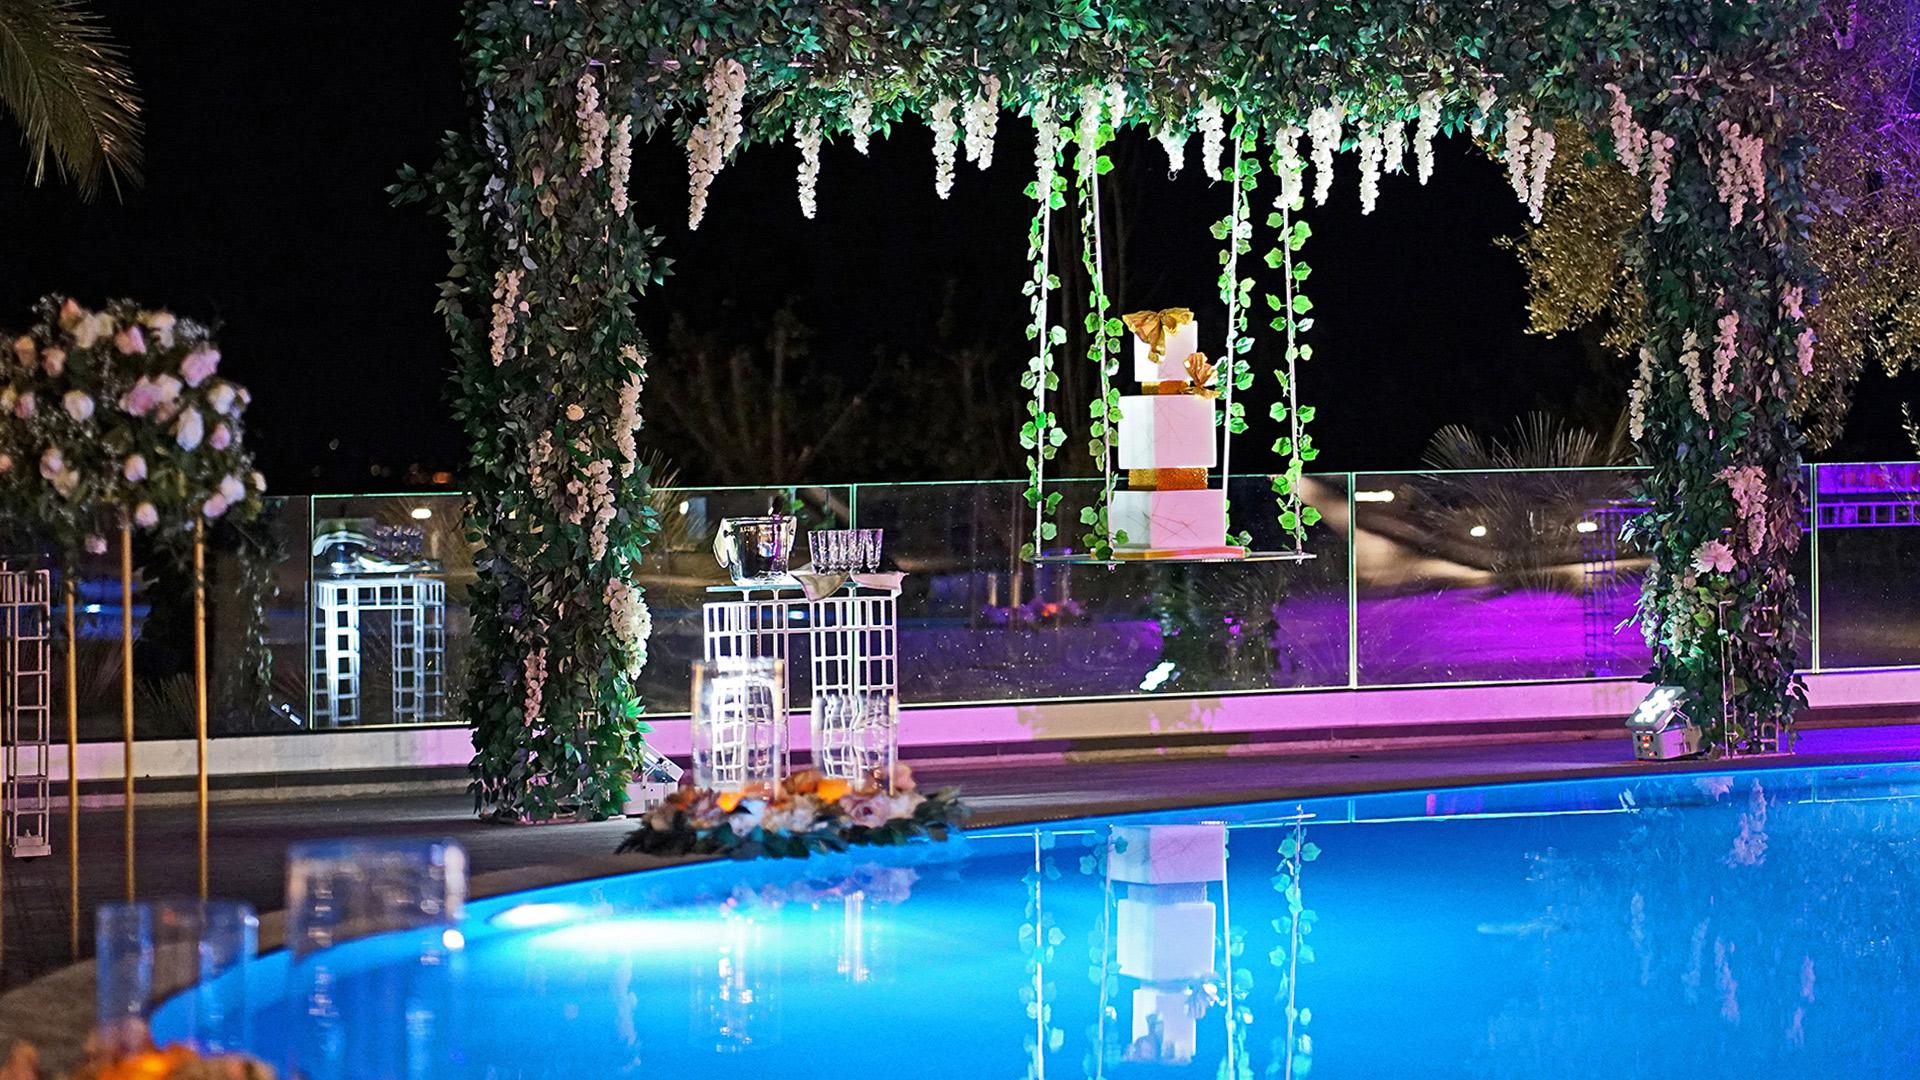 torta in piscina villa antica ledune